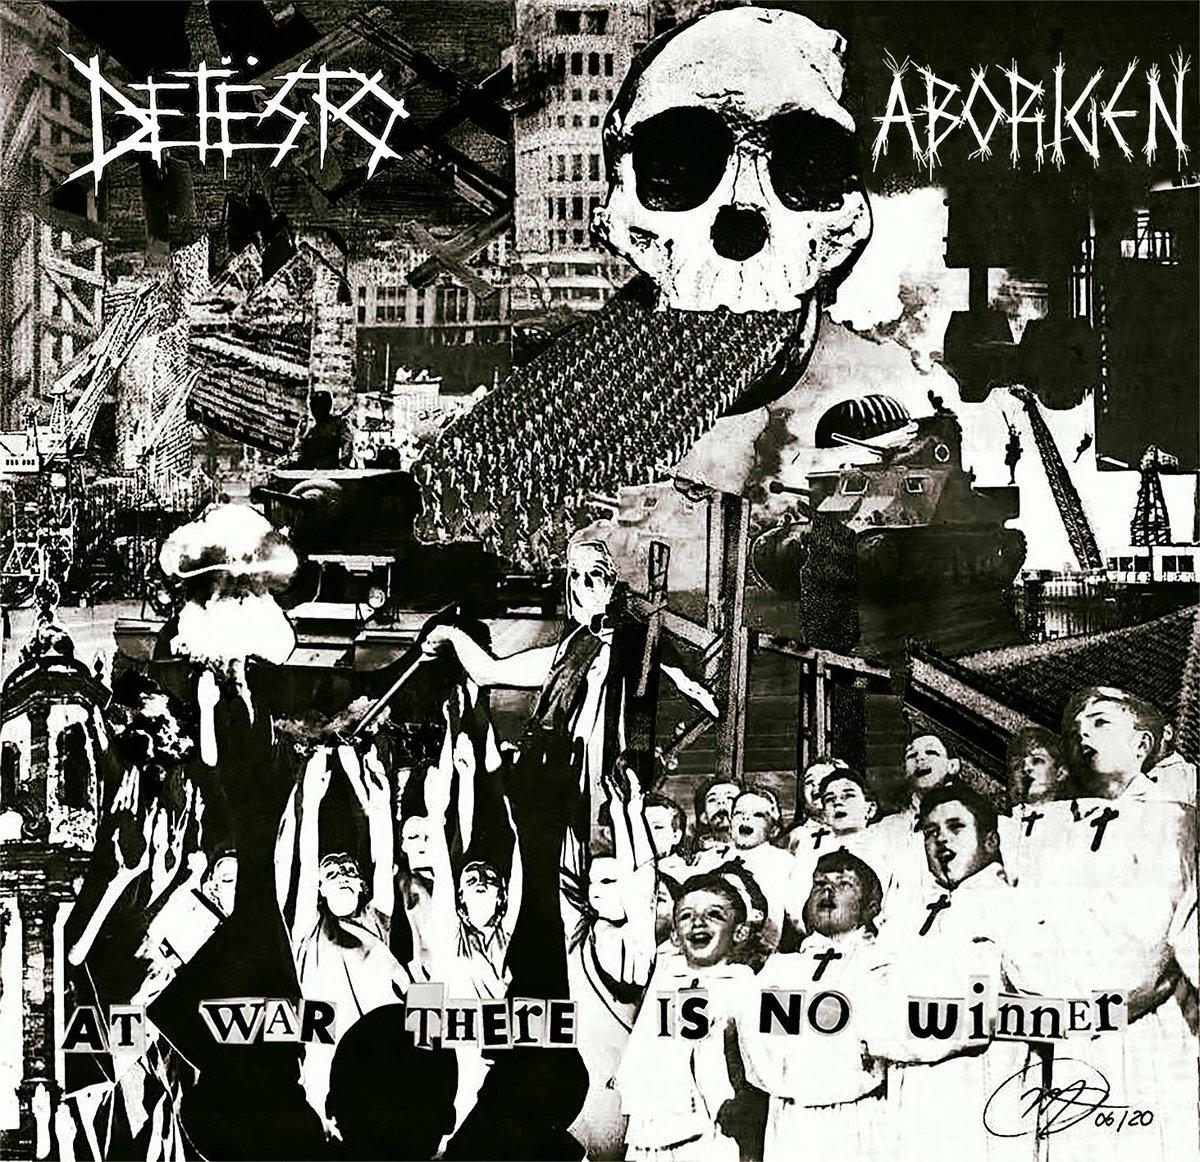 Aborigen/Detesto - At war there is no winner